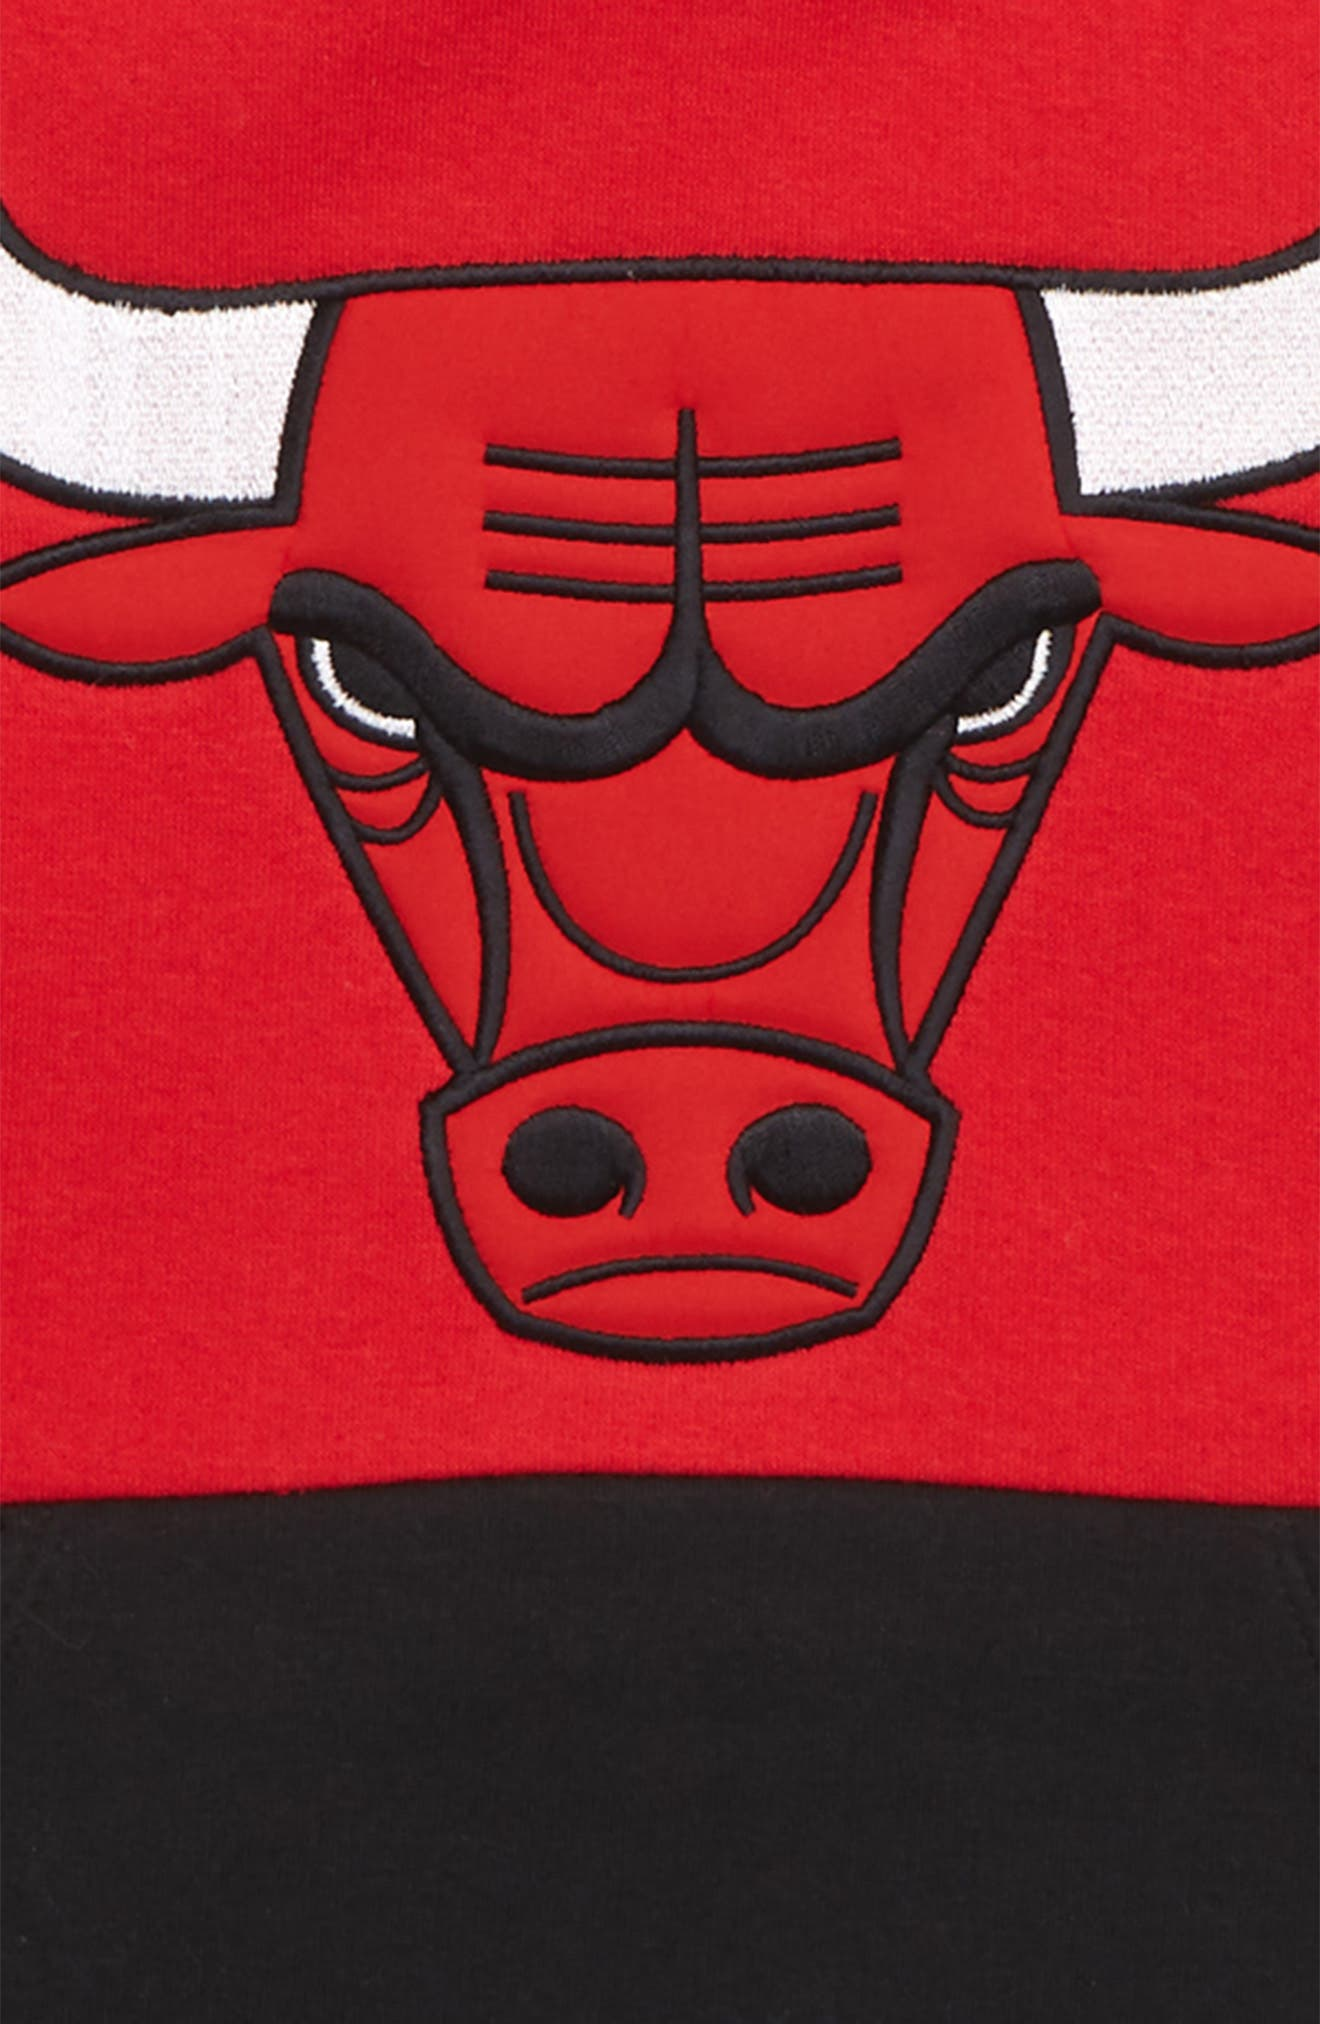 NIKE,                             NBA Logo Chicago Bulls Regulator Hoodie,                             Alternate thumbnail 2, color,                             GREY MULTI